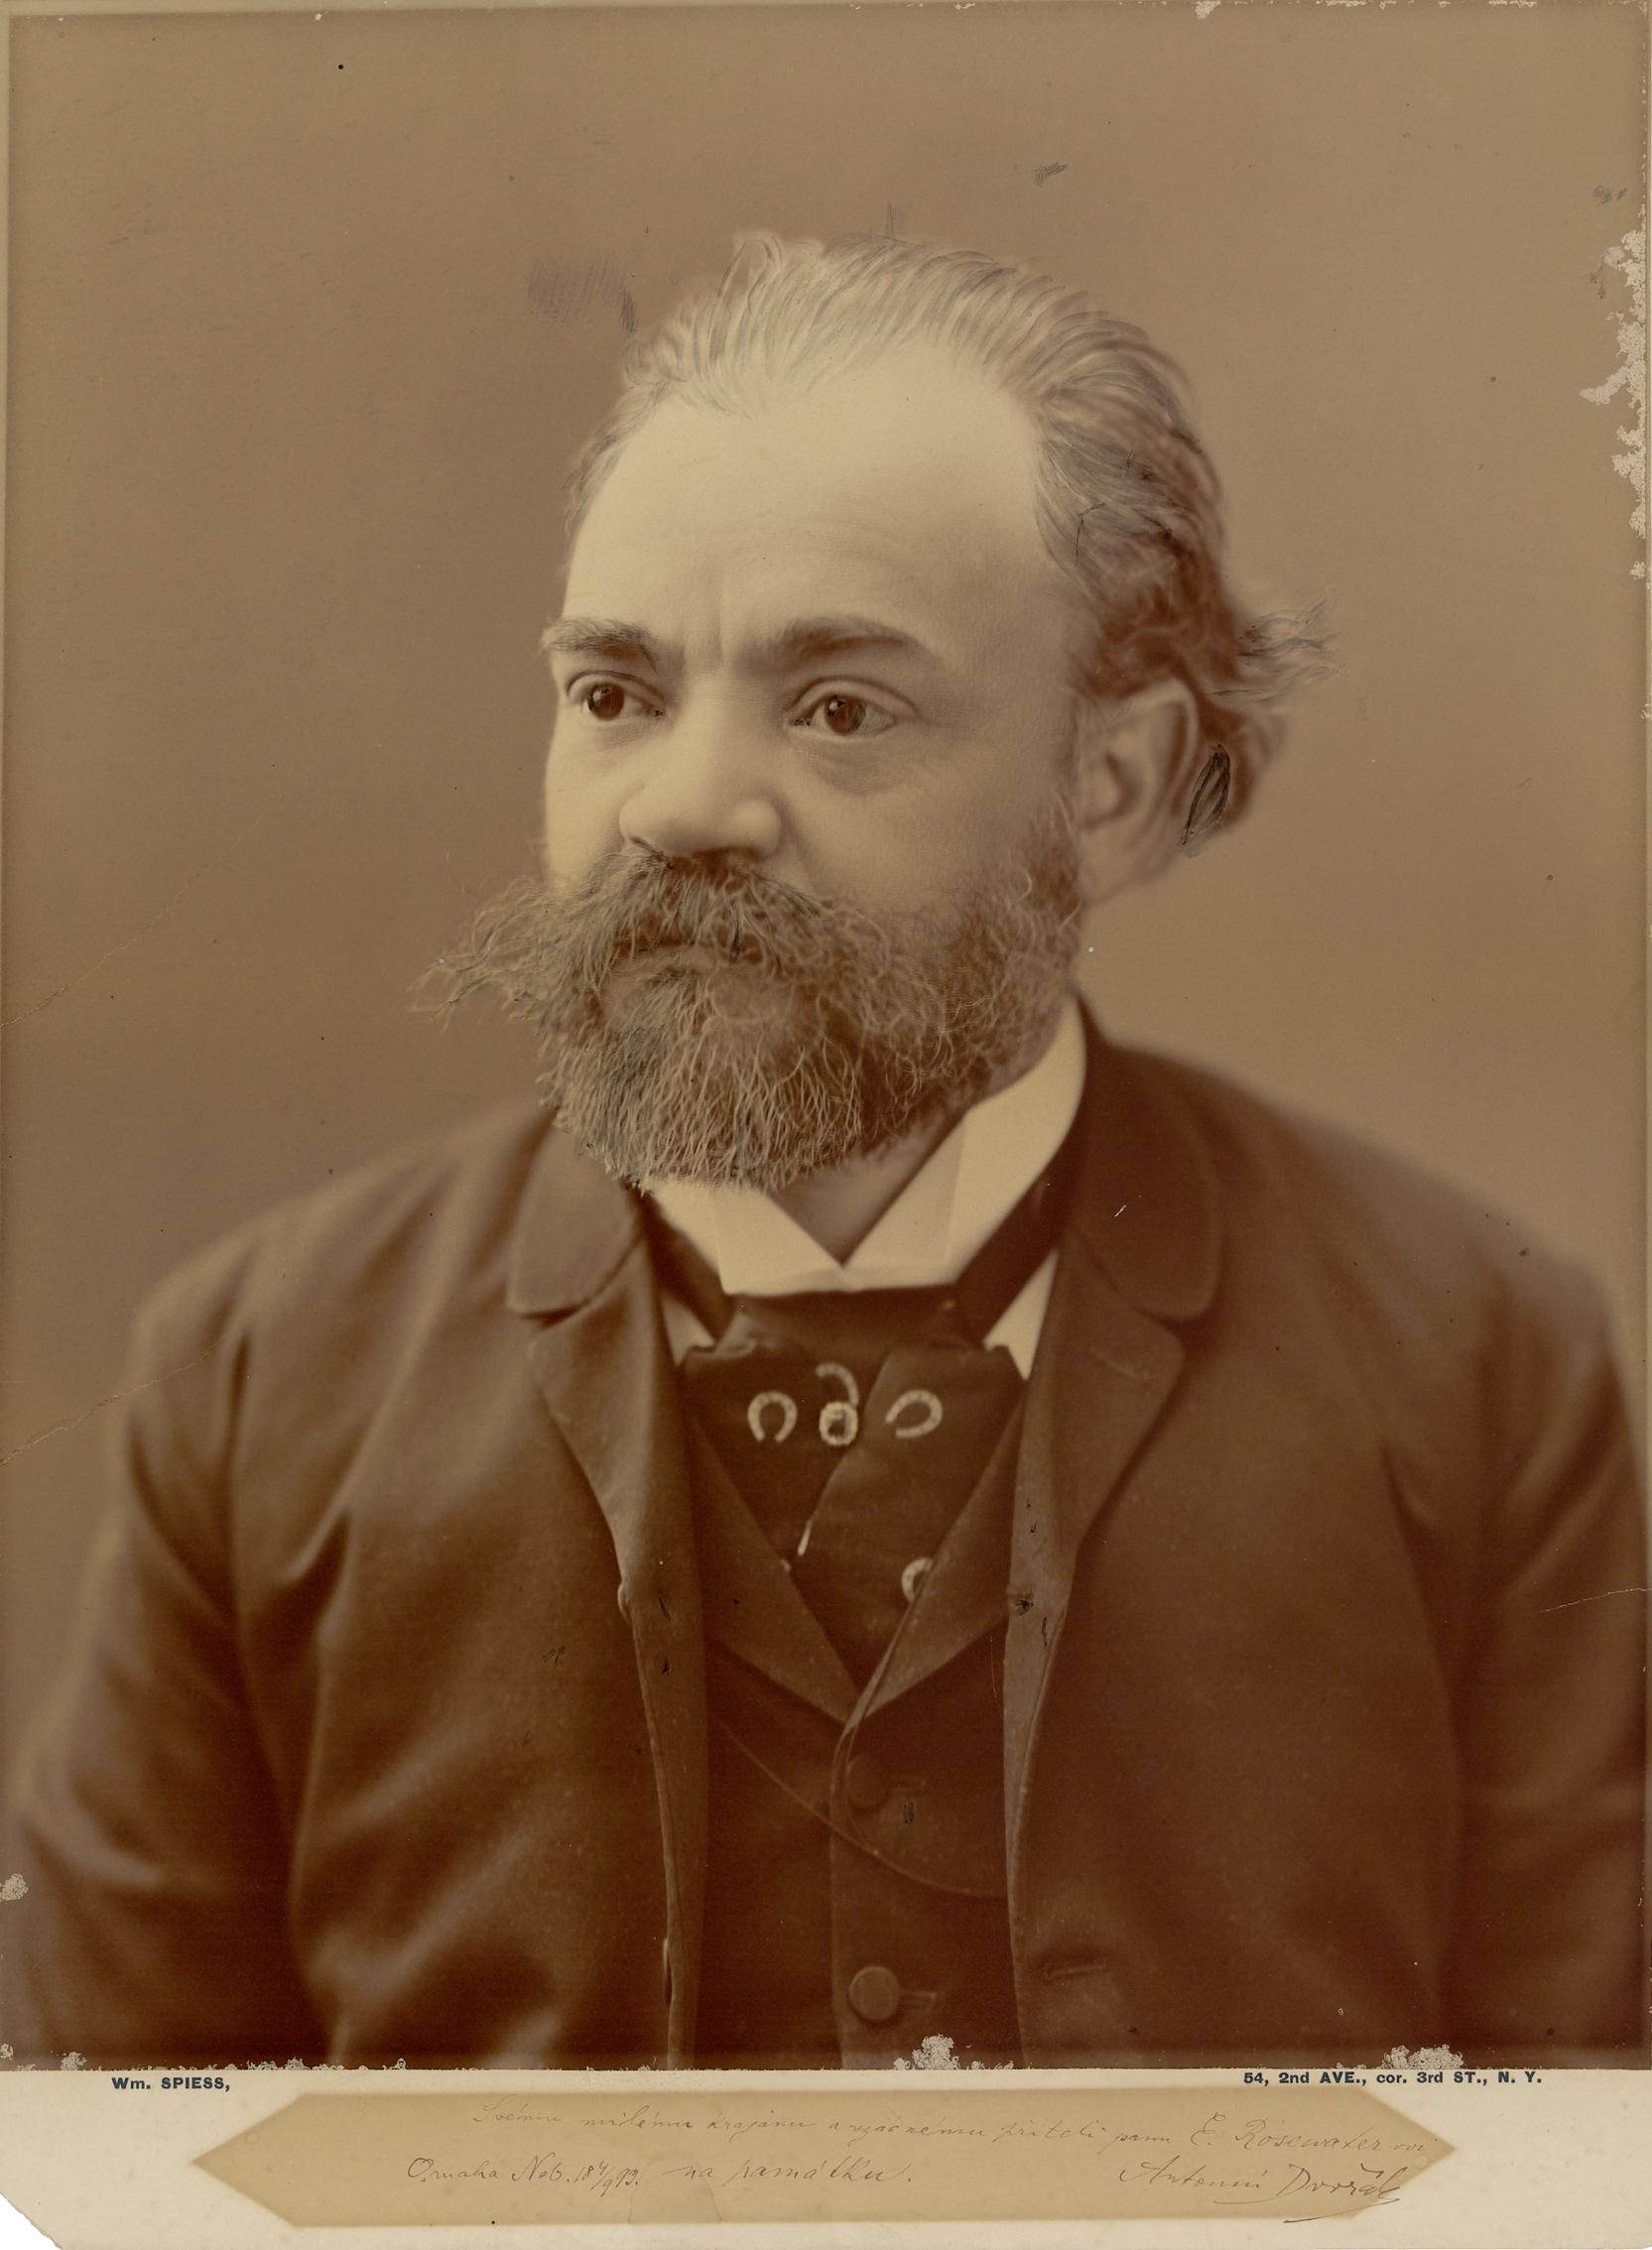 Antonín Dvořák circa 1883, DAHA Archive.